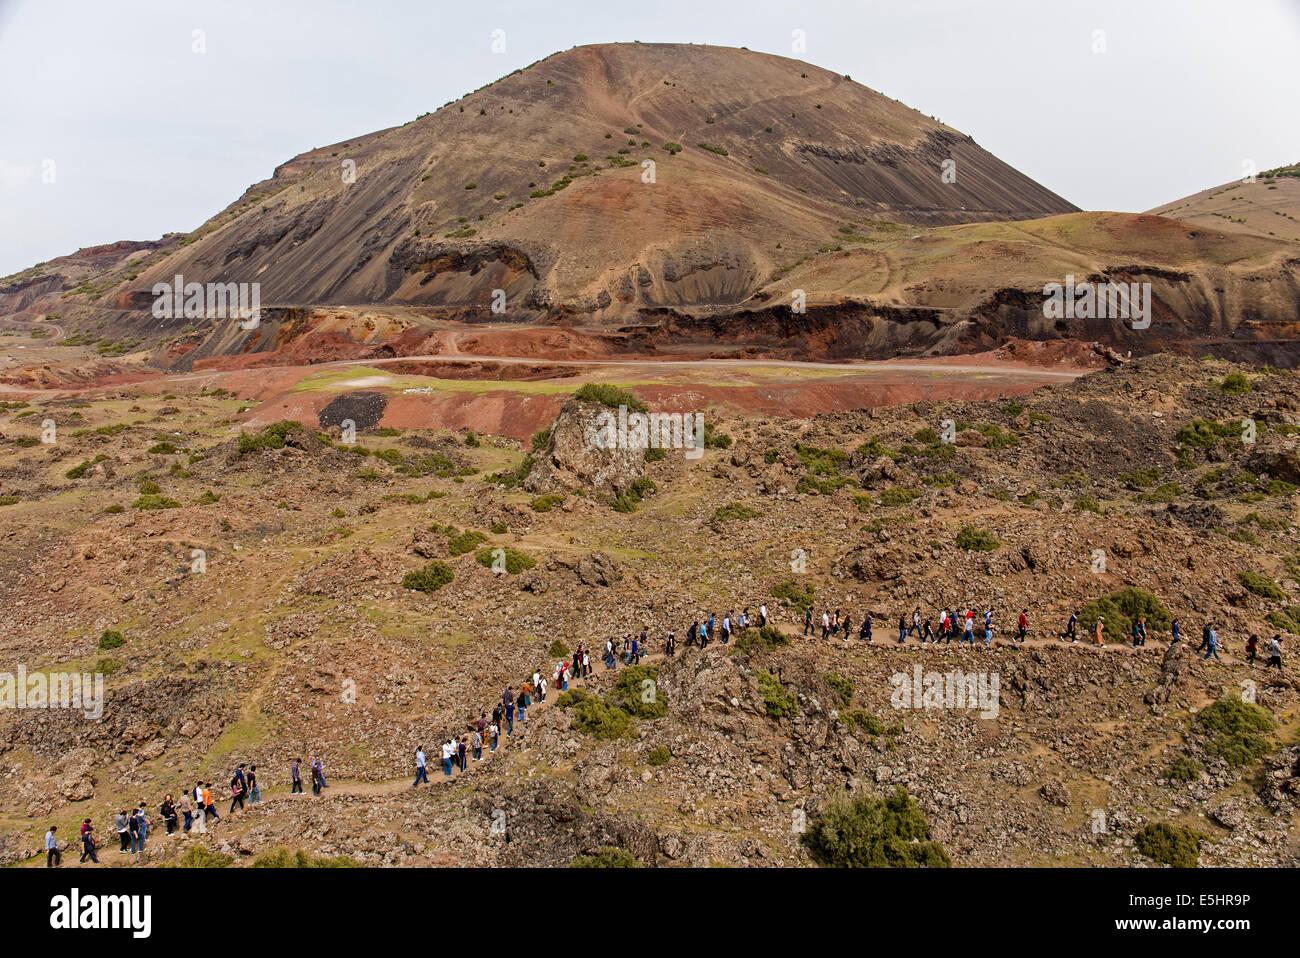 Kula Volcanic Cones and visitor in Kula Geologic Park Manisa Turkey - Stock Image